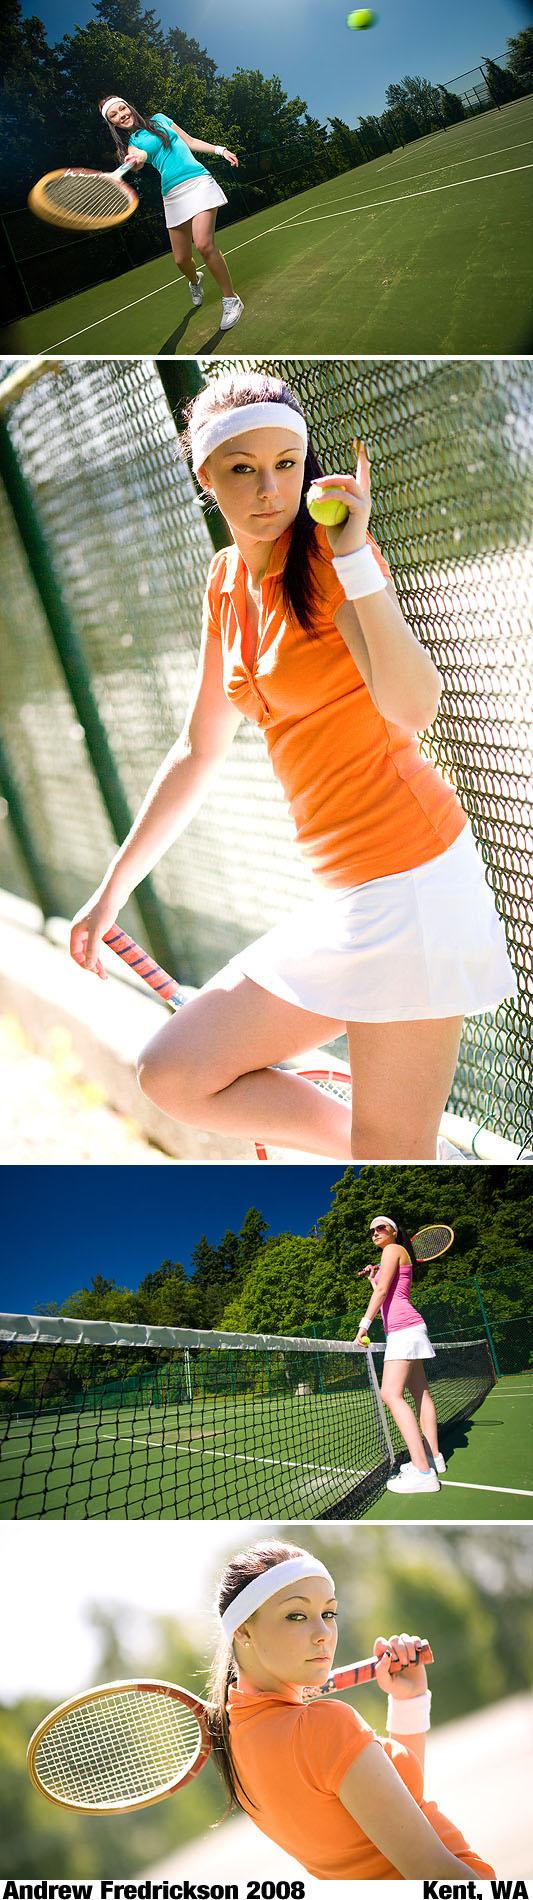 kent, wa Jun 28, 2008 first time playing tennis in my life!